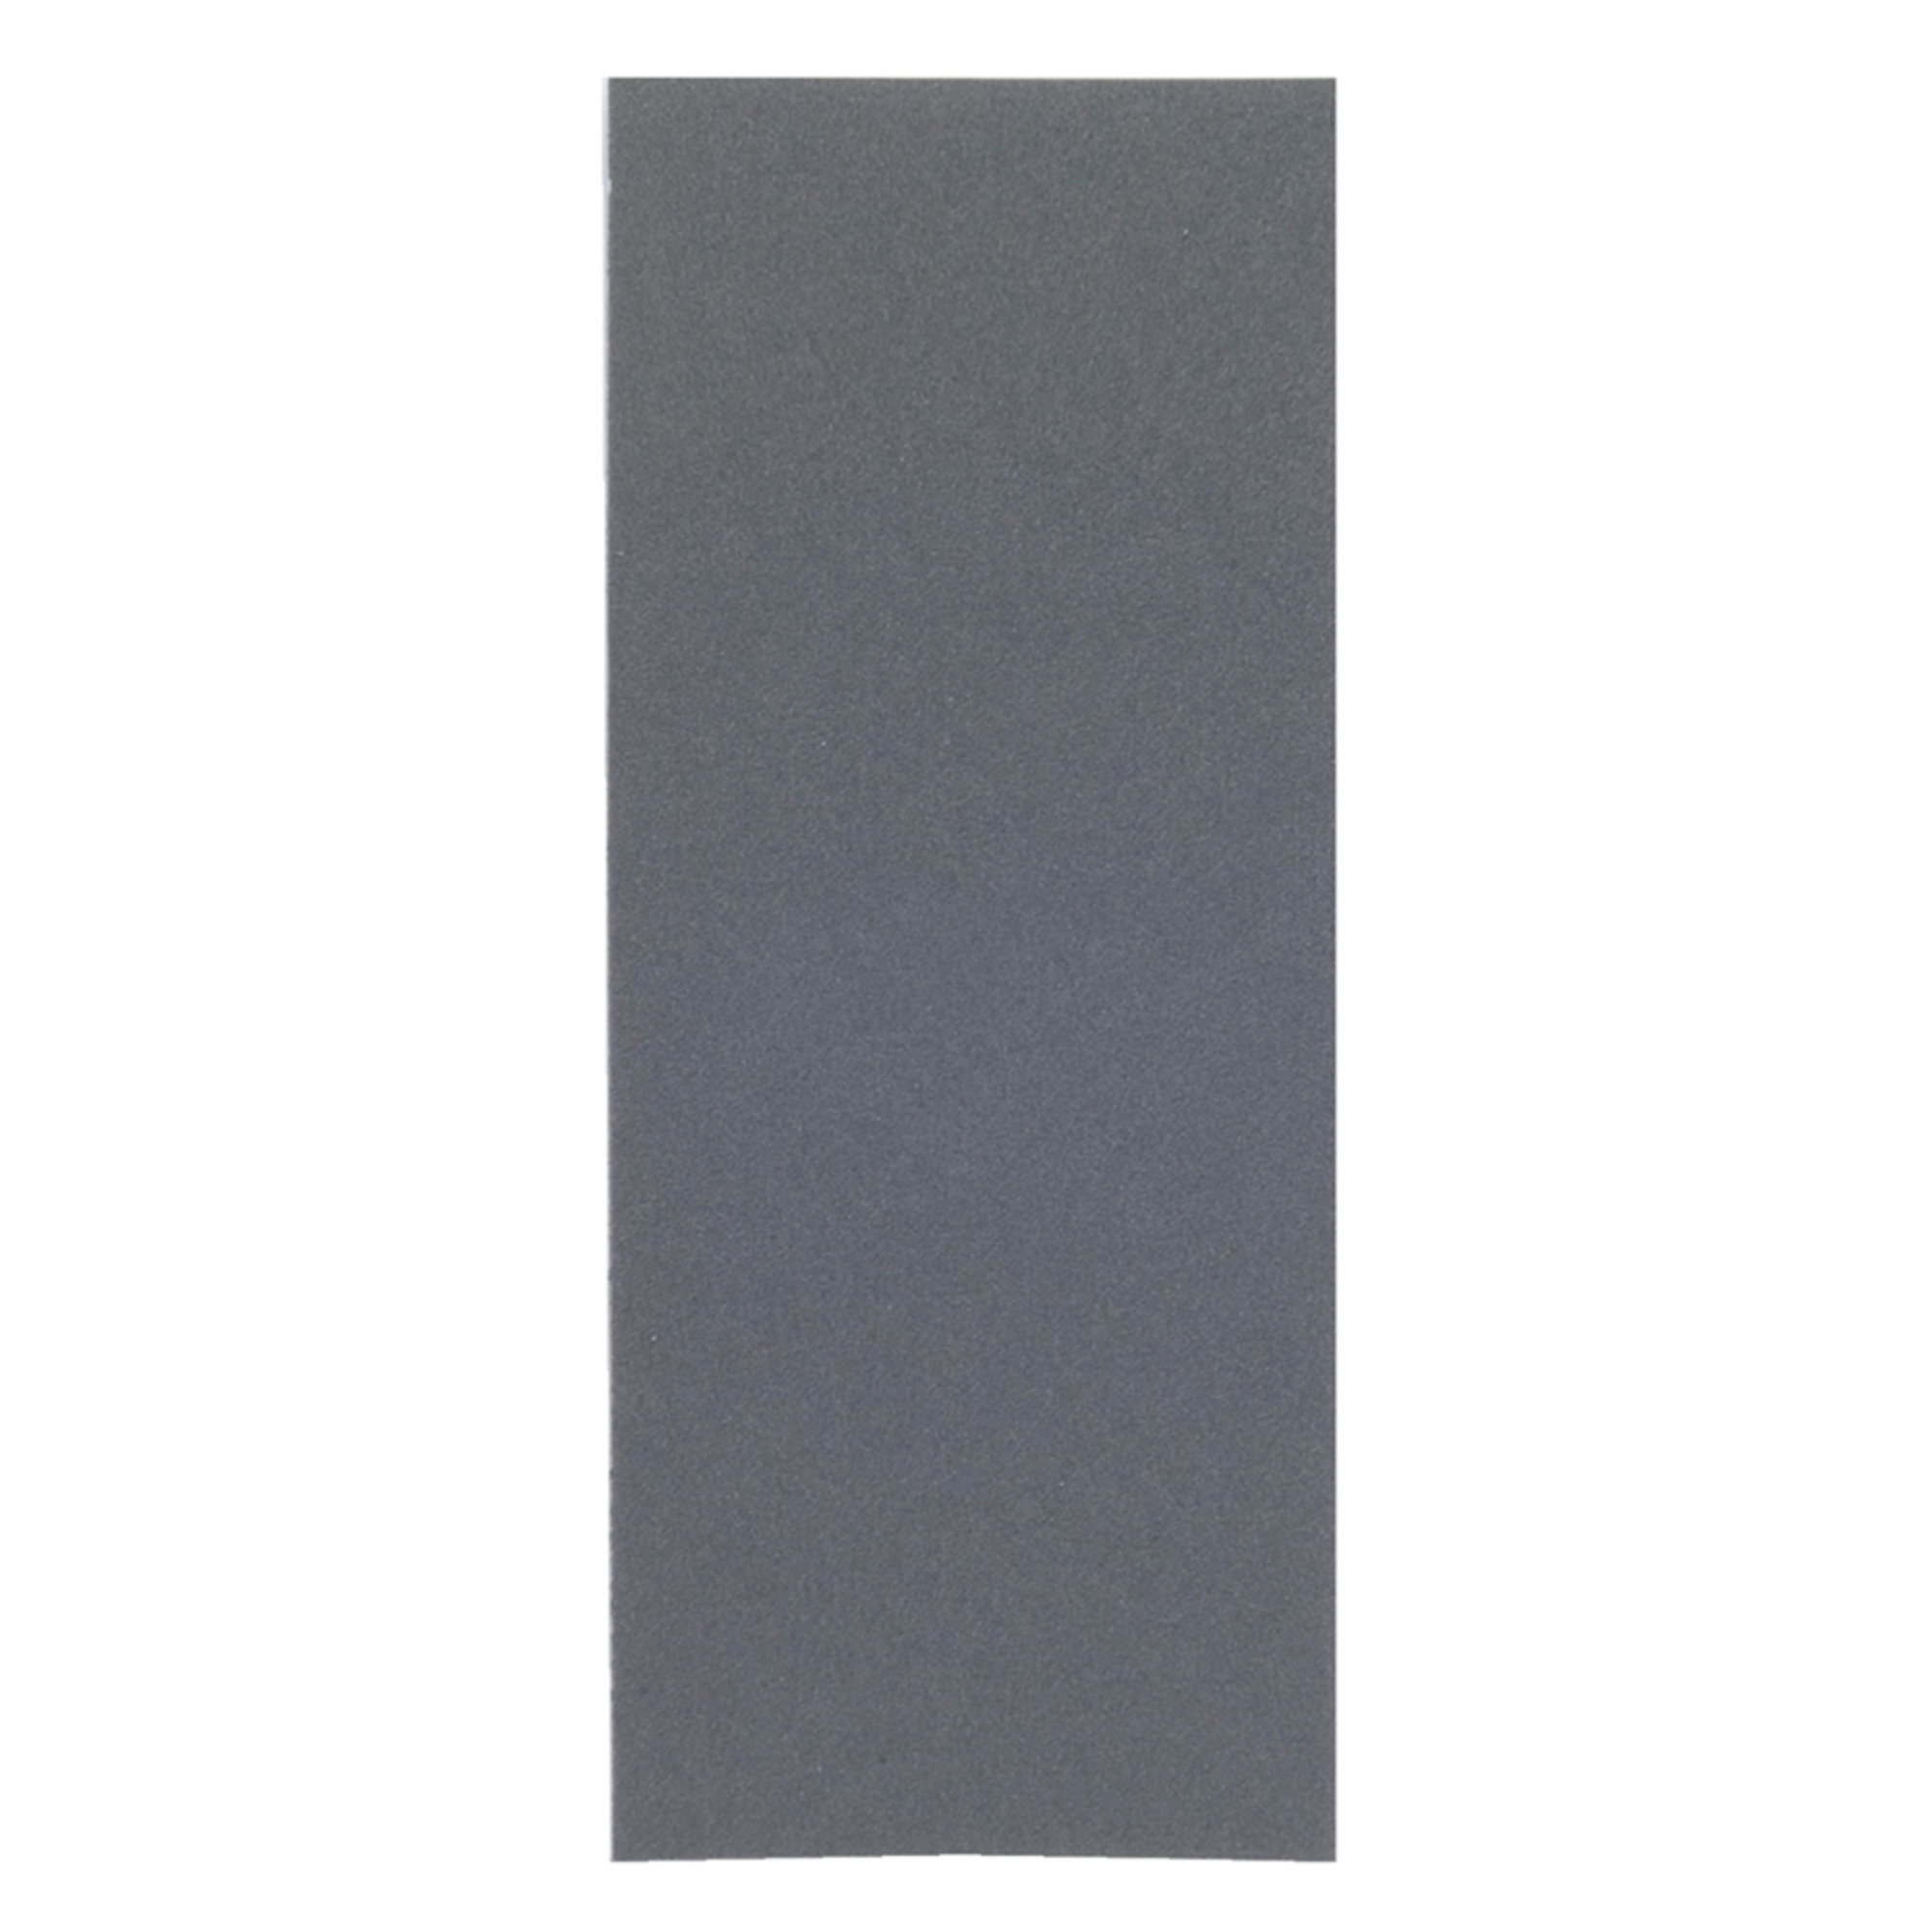 Norton® Blue-Bak™ 66261139354 T414 Coated Sandpaper Sheet, 9 in L x 3-2/3 in W, 400 Grit, Super Fine Grade, Silicon Carbide Abrasive, Paper Backing